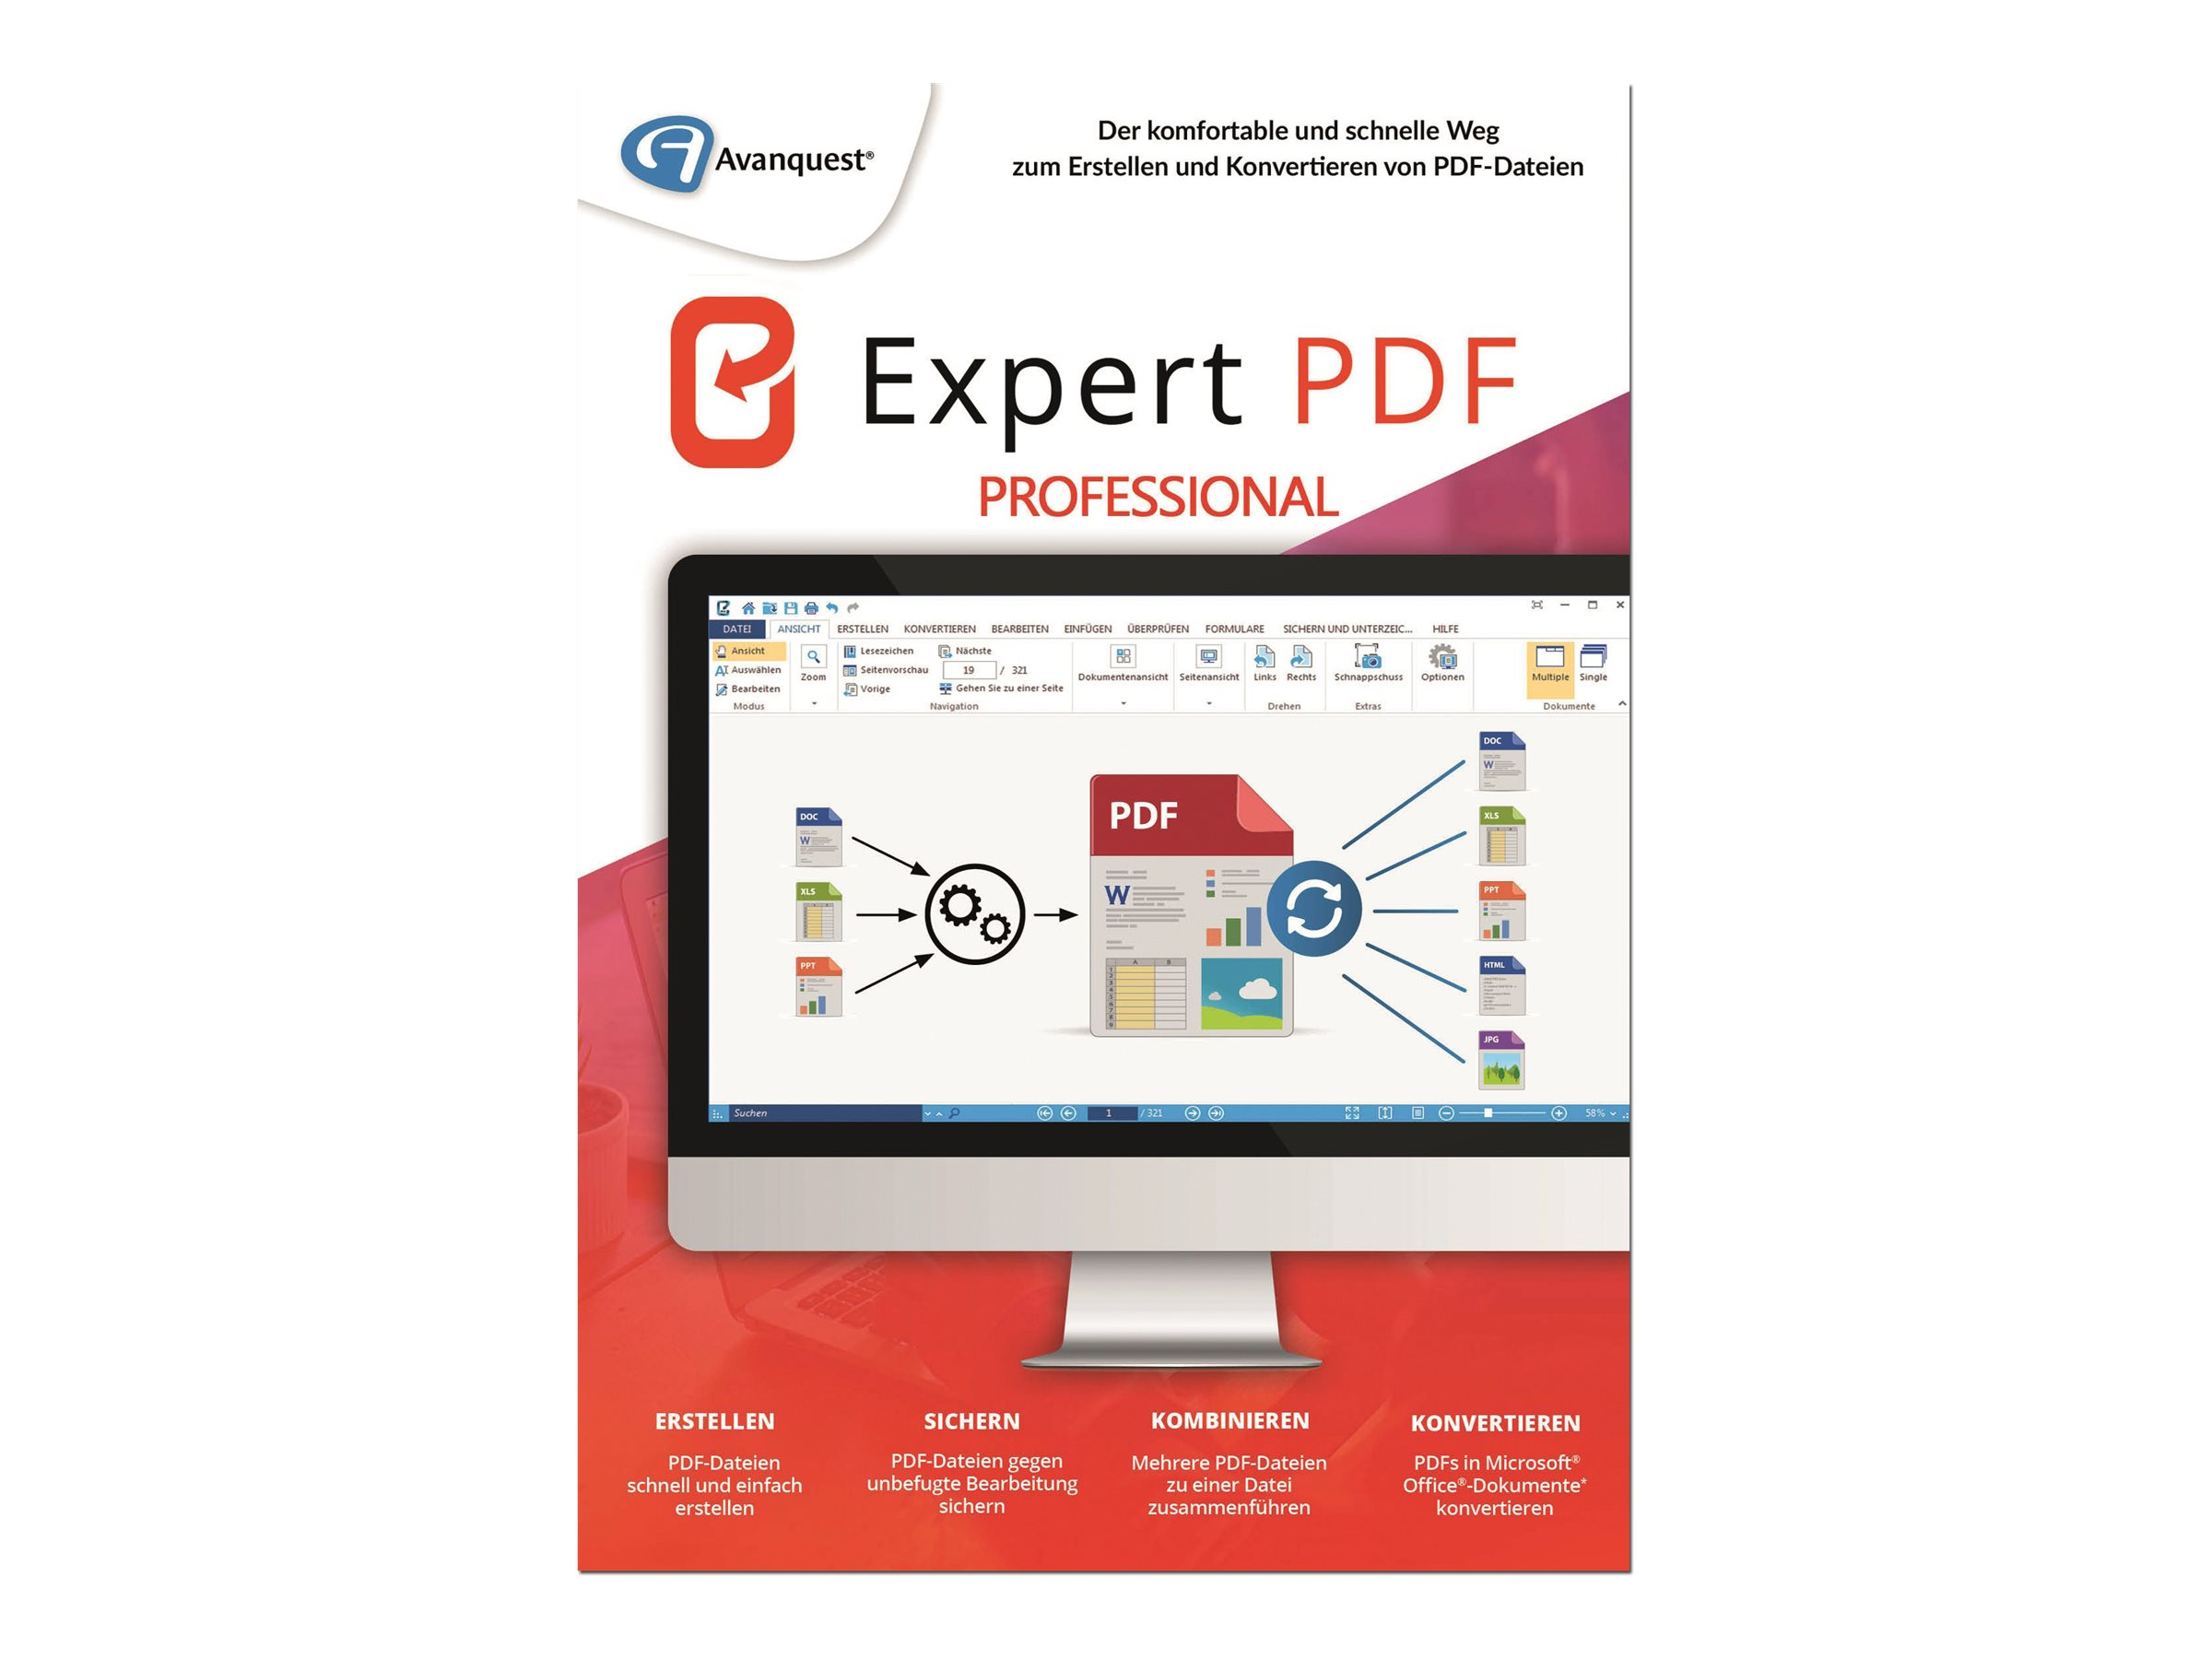 Avanquest Software eXPert PDF Professional - (v. 14) - Lizenz - 1 Benutzer